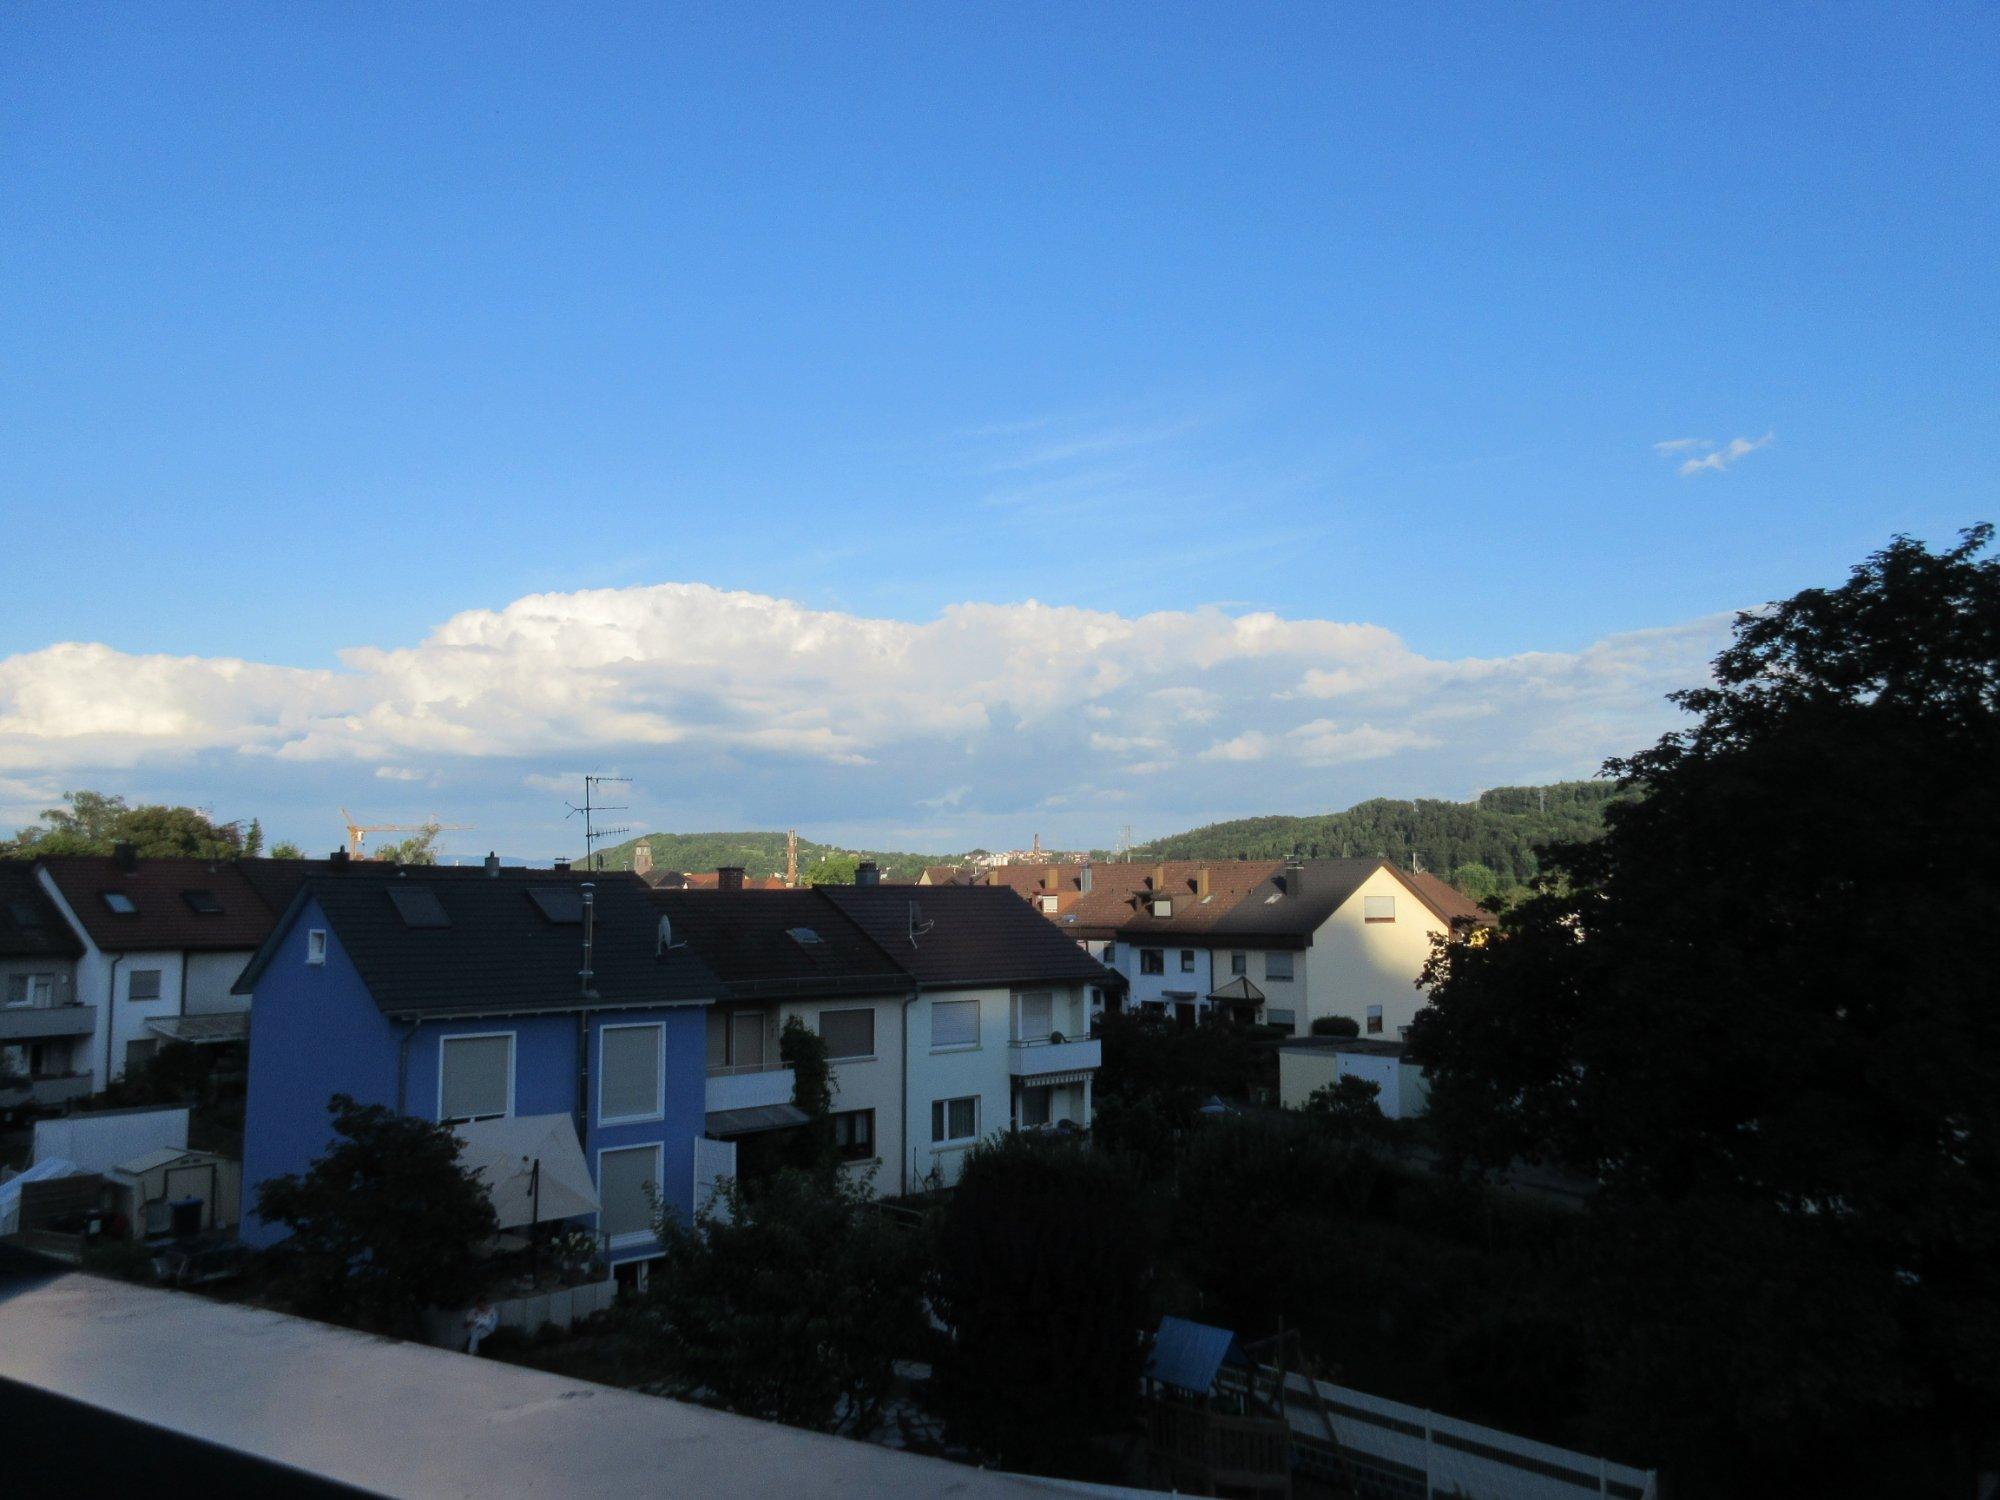 Burghotel Lorrach